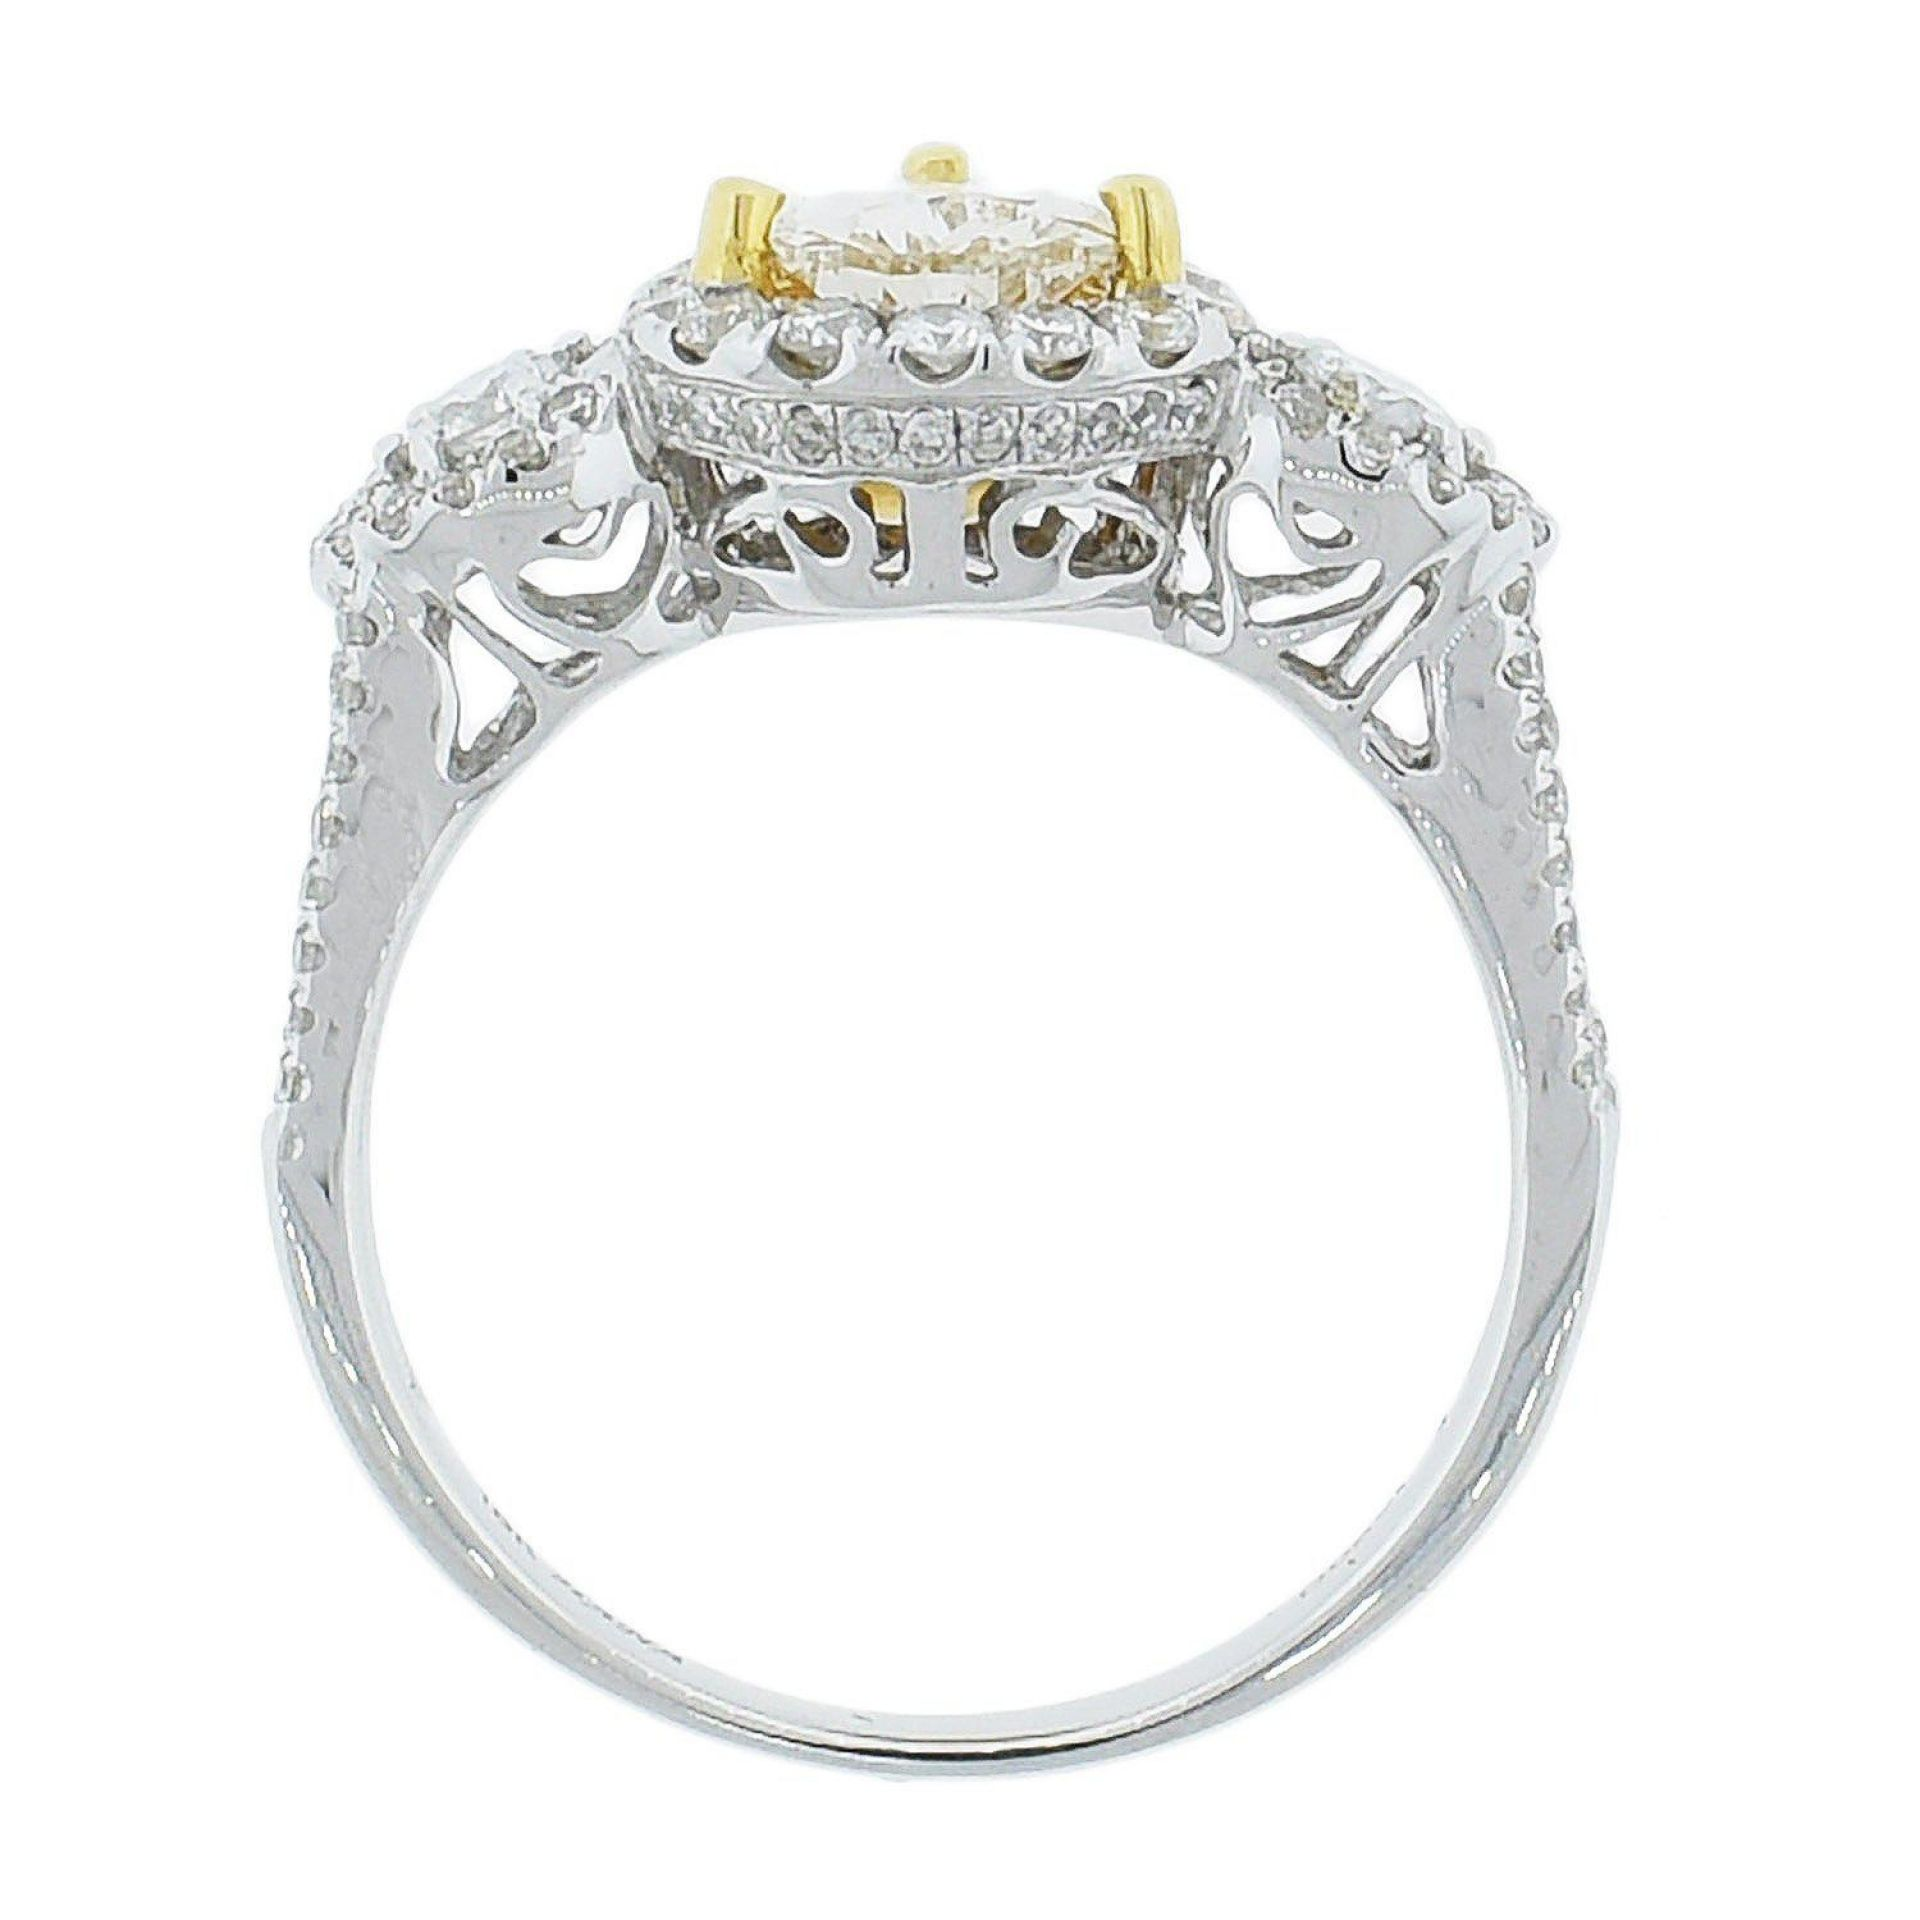 0.95ct SI1 CLARITY CENTER Diamond Ring (1.64ctw Diamonds) EGL USA CERTIFIED